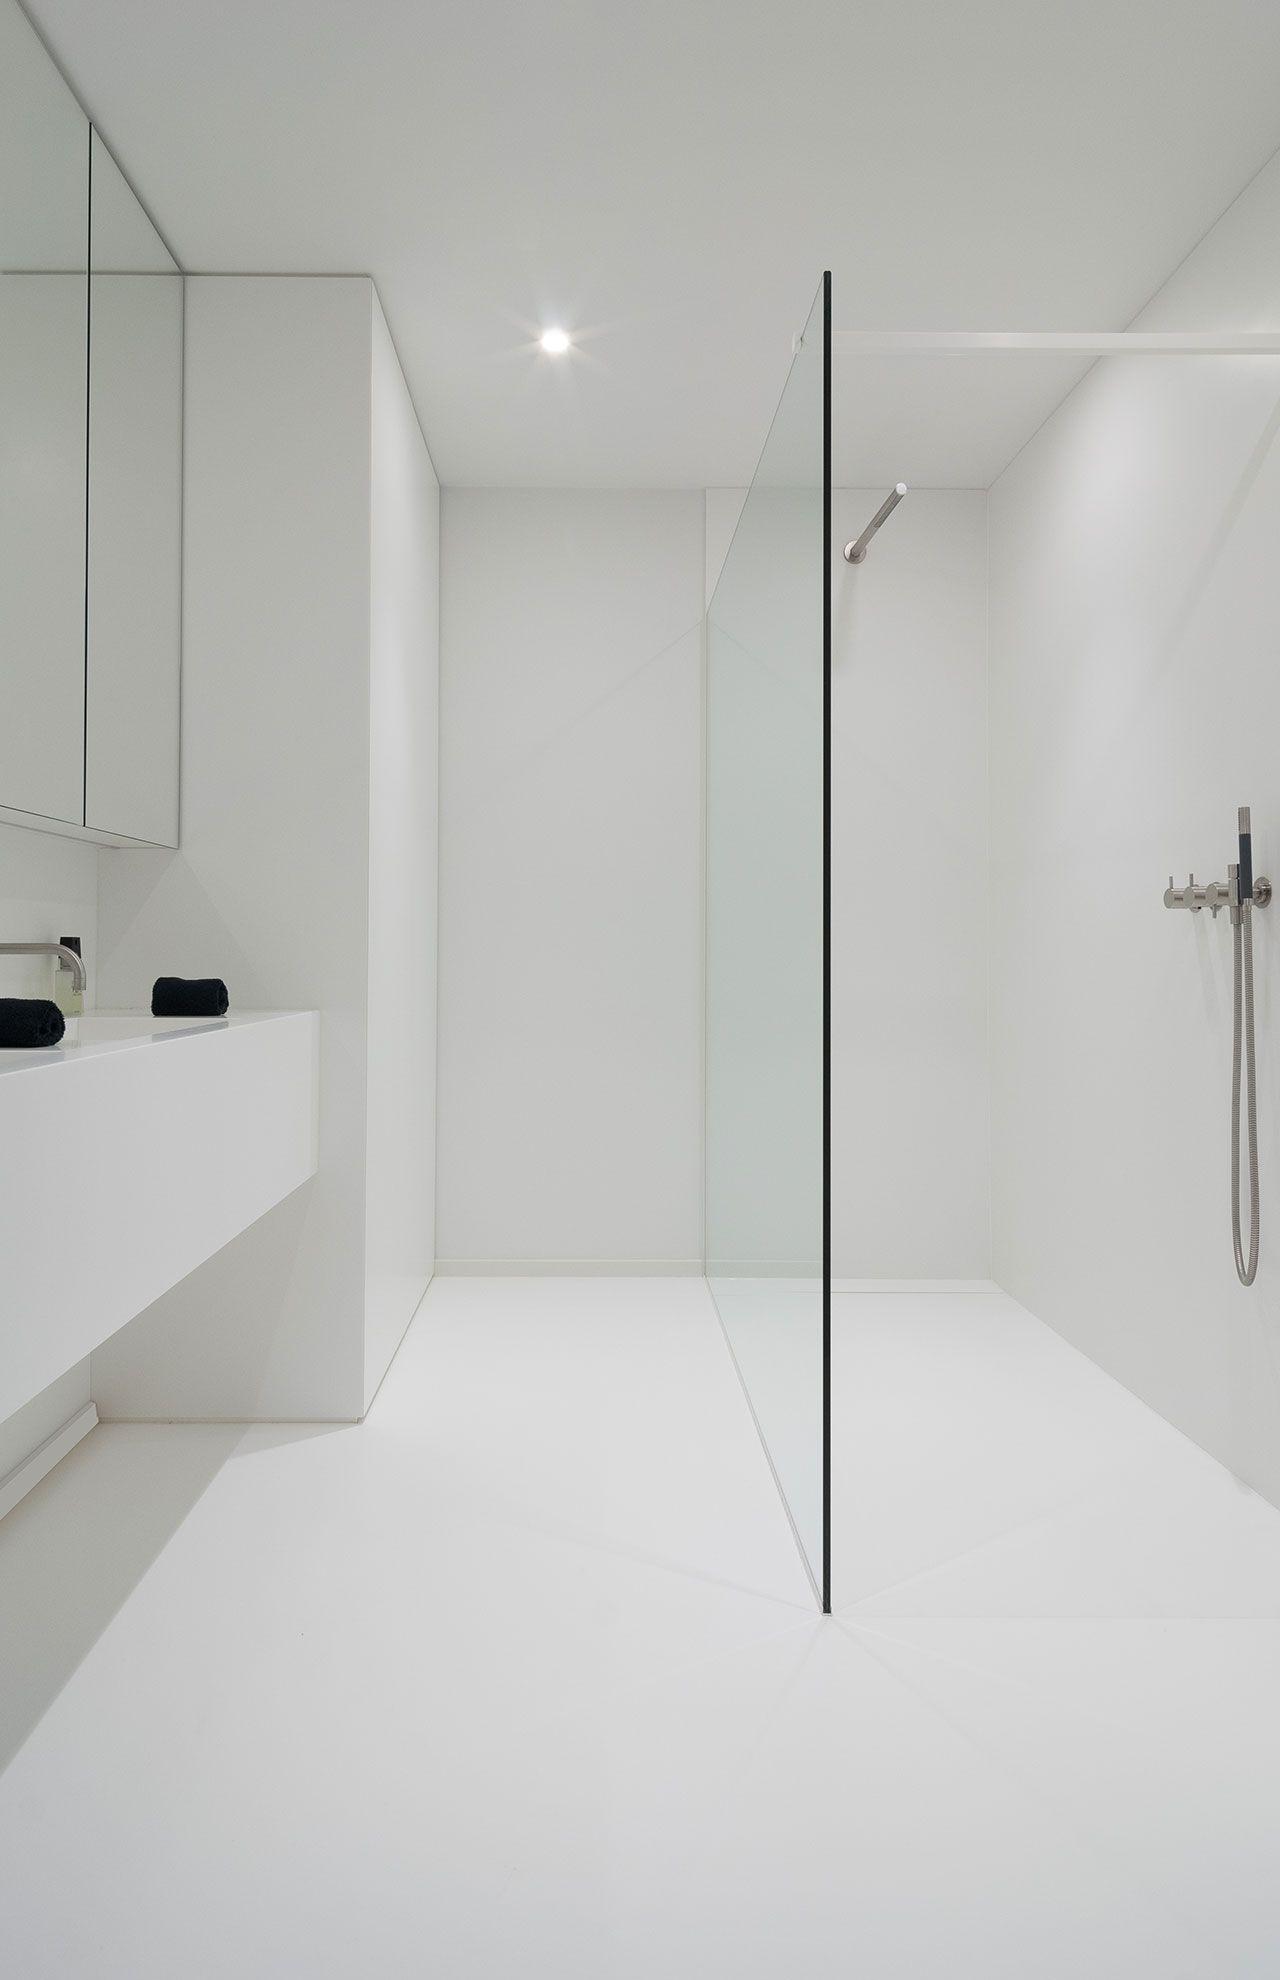 Bathroom Inspiration #bathroom #white #inspiration #floor ...